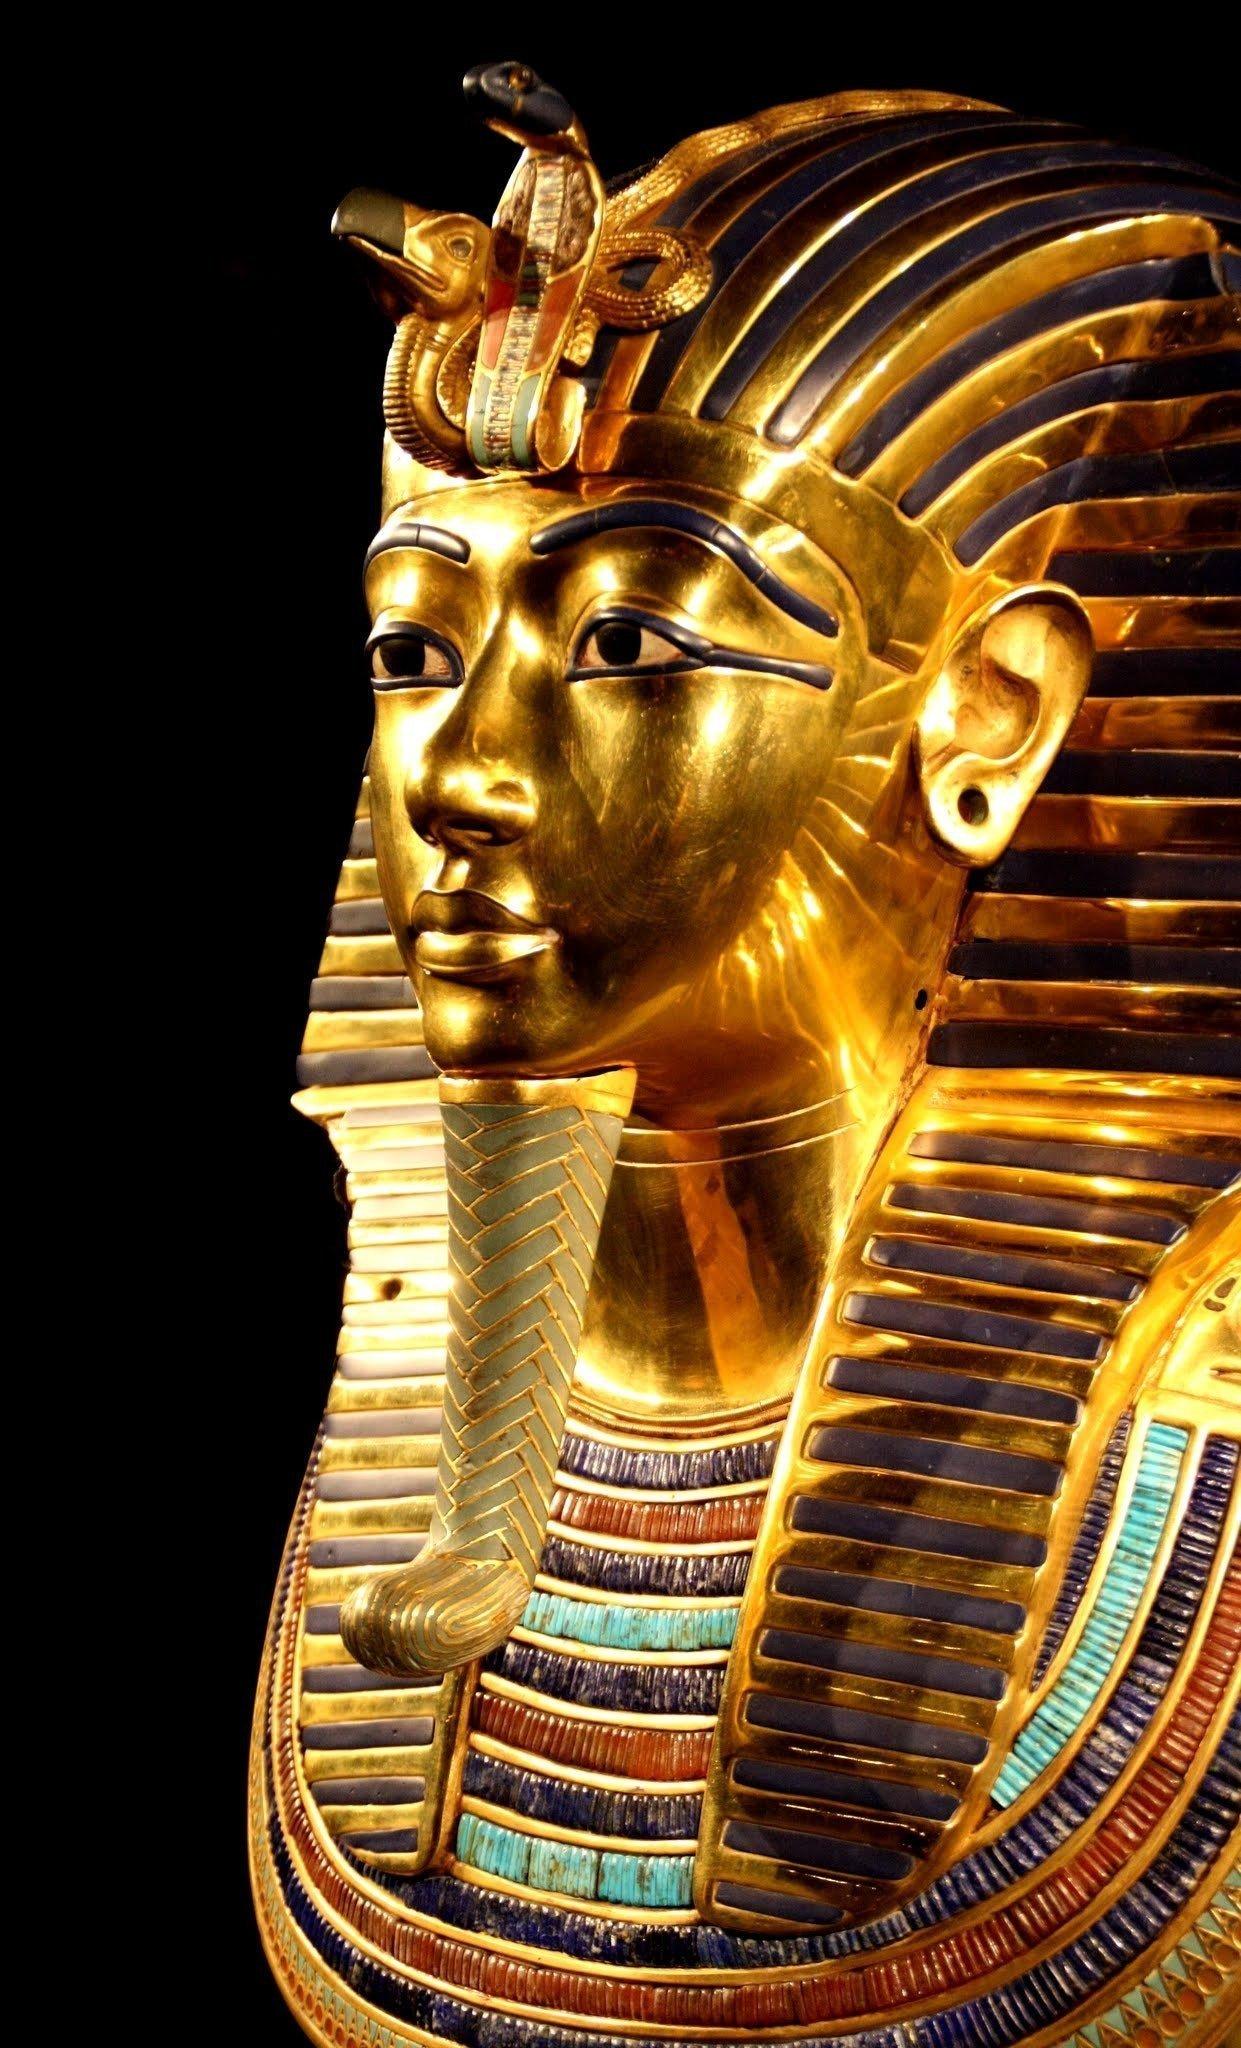 ancient-death-mask-egypt-33571